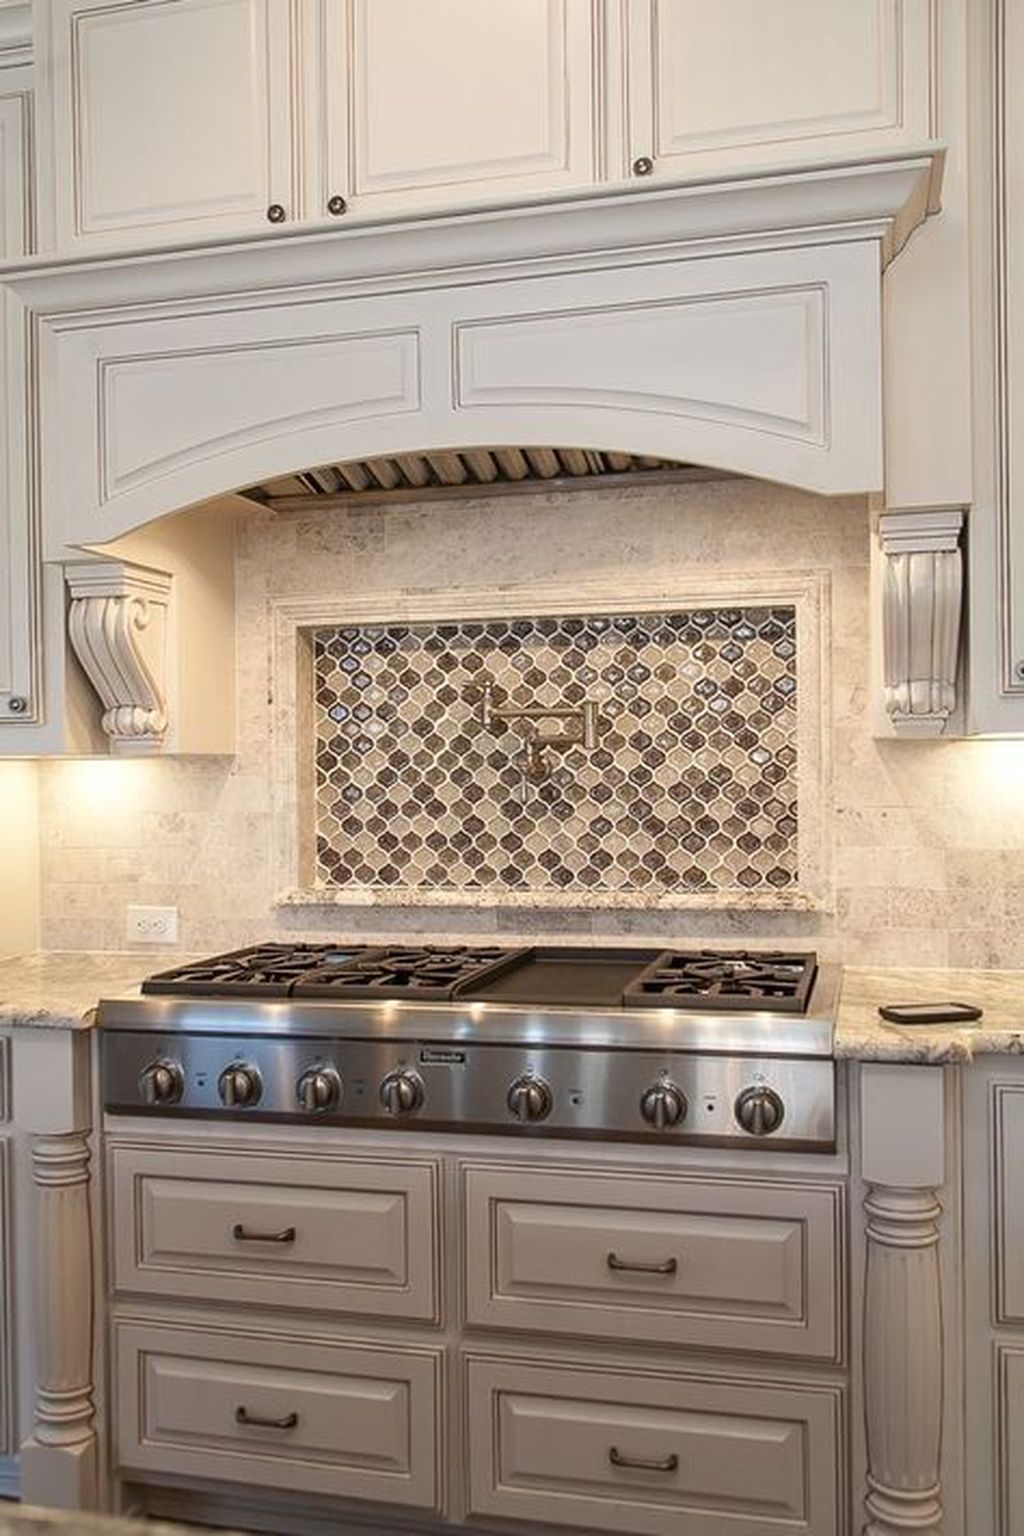 Impressive gorgeous summer kitchen backsplash ideas shabby